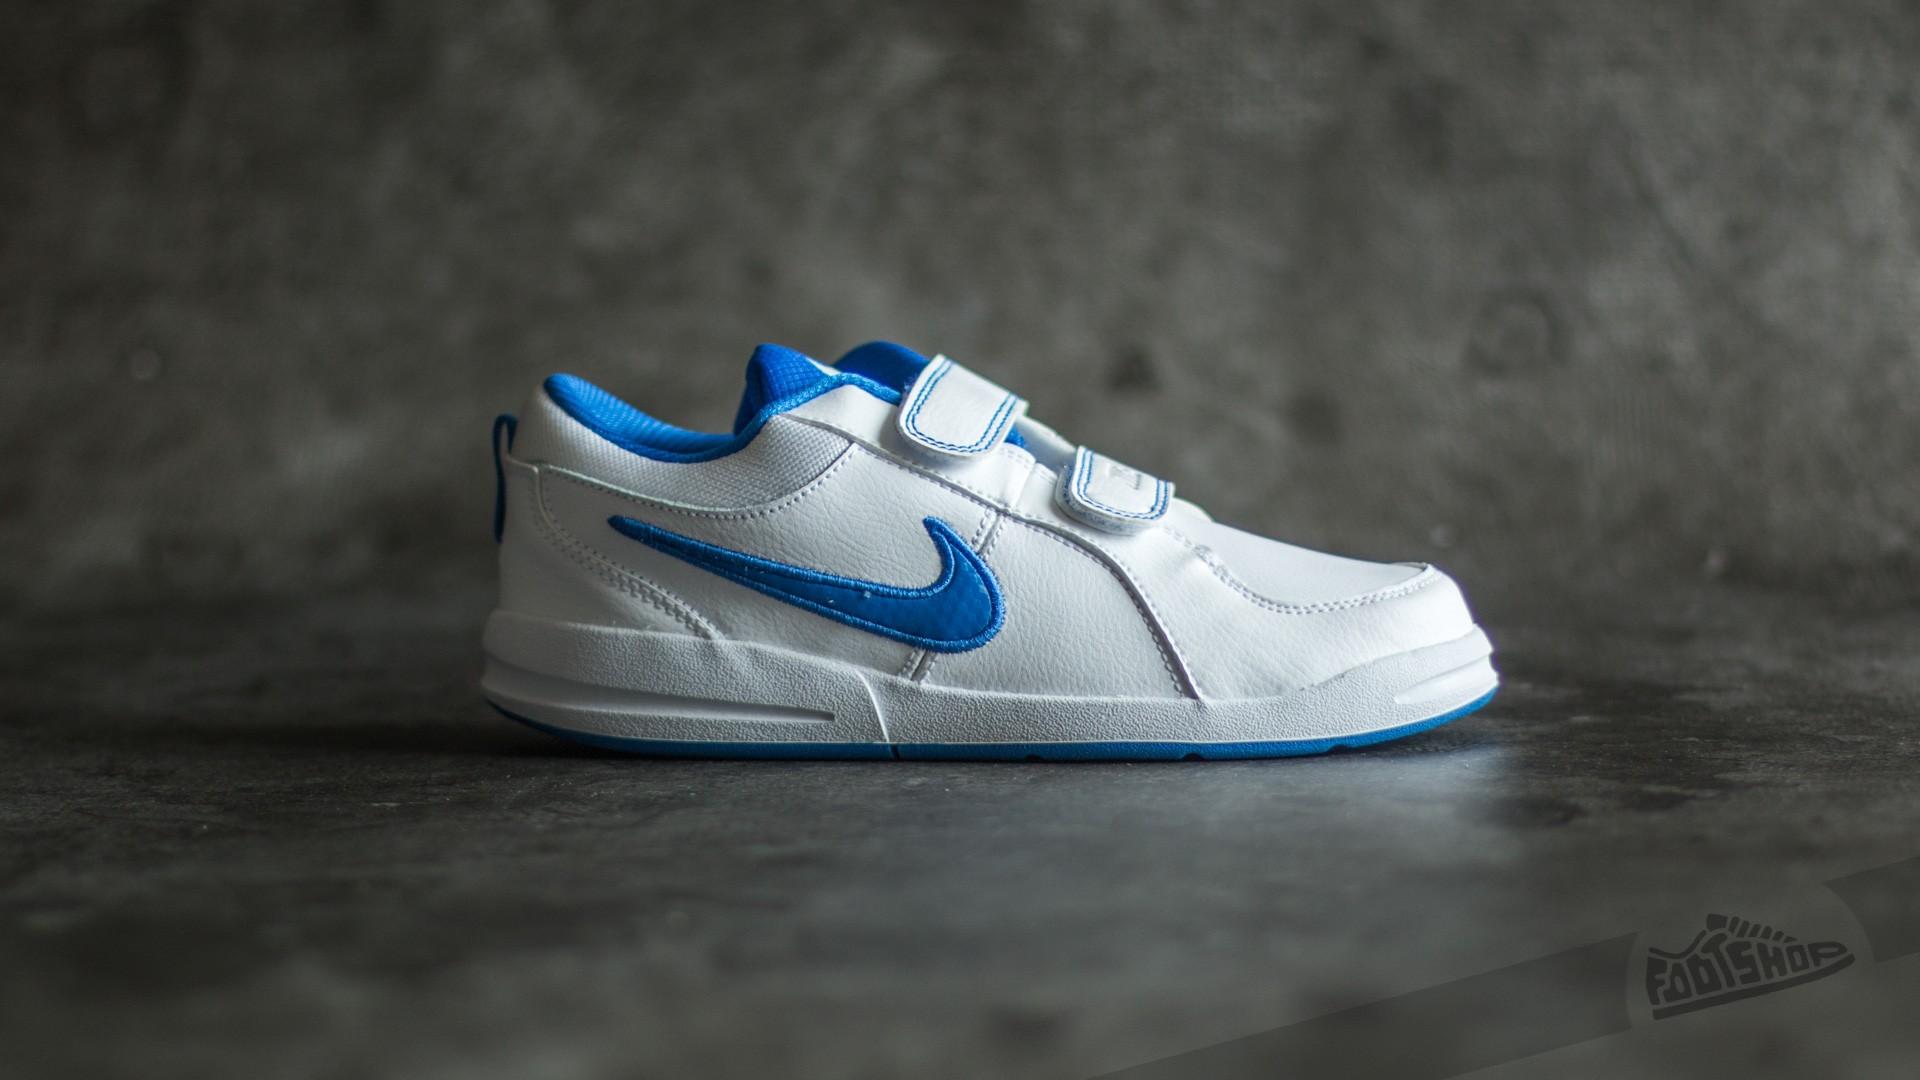 new product 5adf3 1b75e Nike Pico 4 (PSV) White  Hyper Cobalt